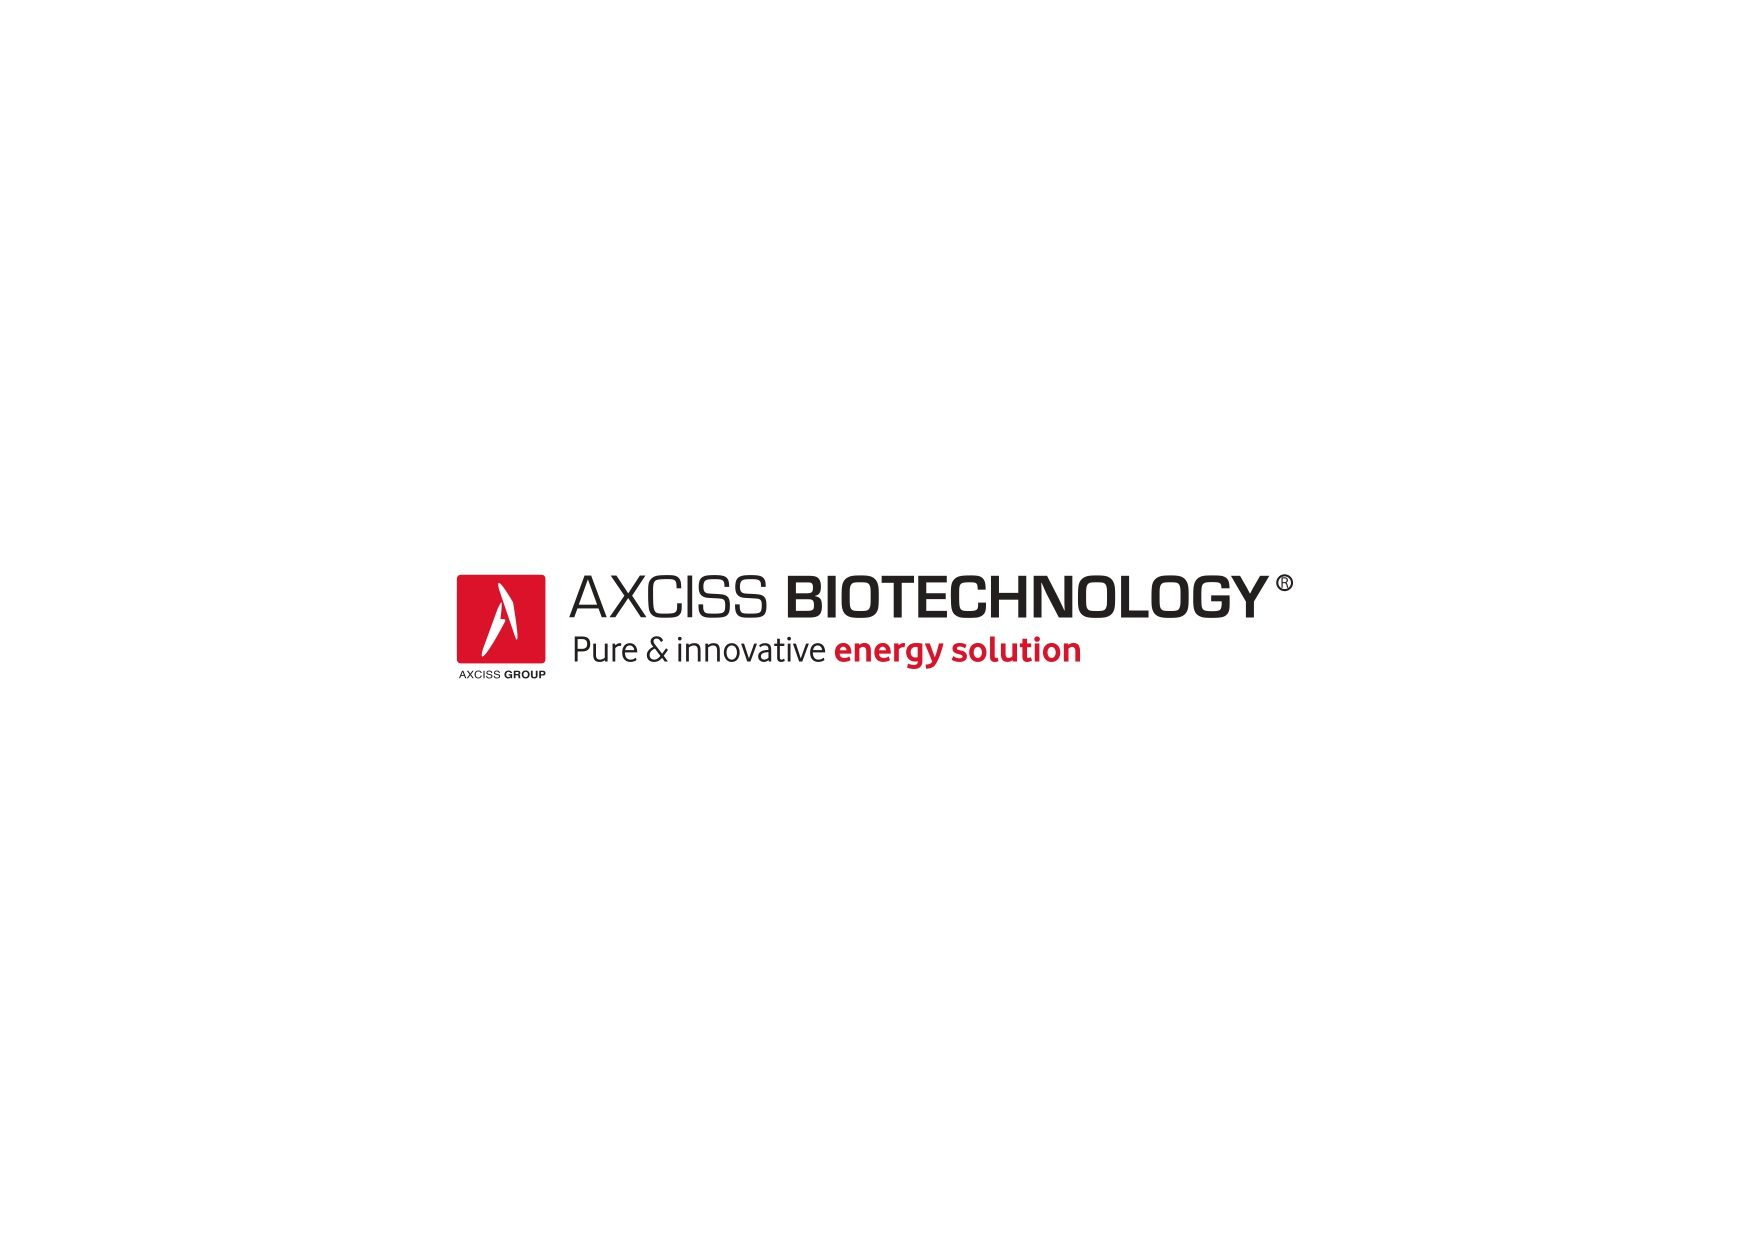 AXCISS BIOTECHNOLOGY